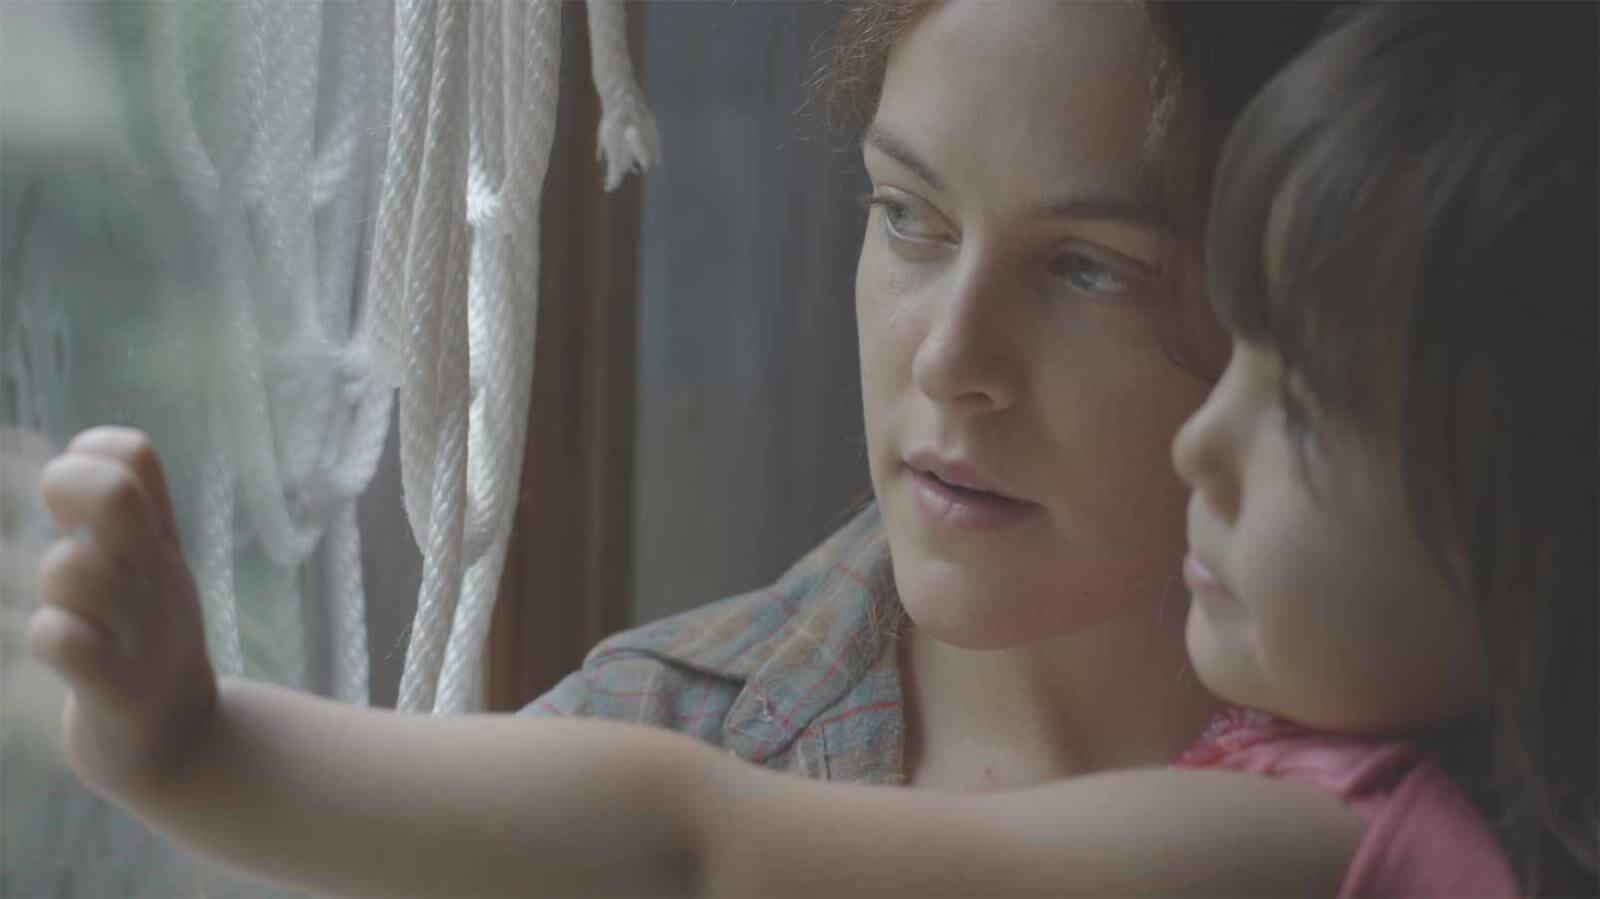 lovesong-riley-keough-jena-malone-2016-movie